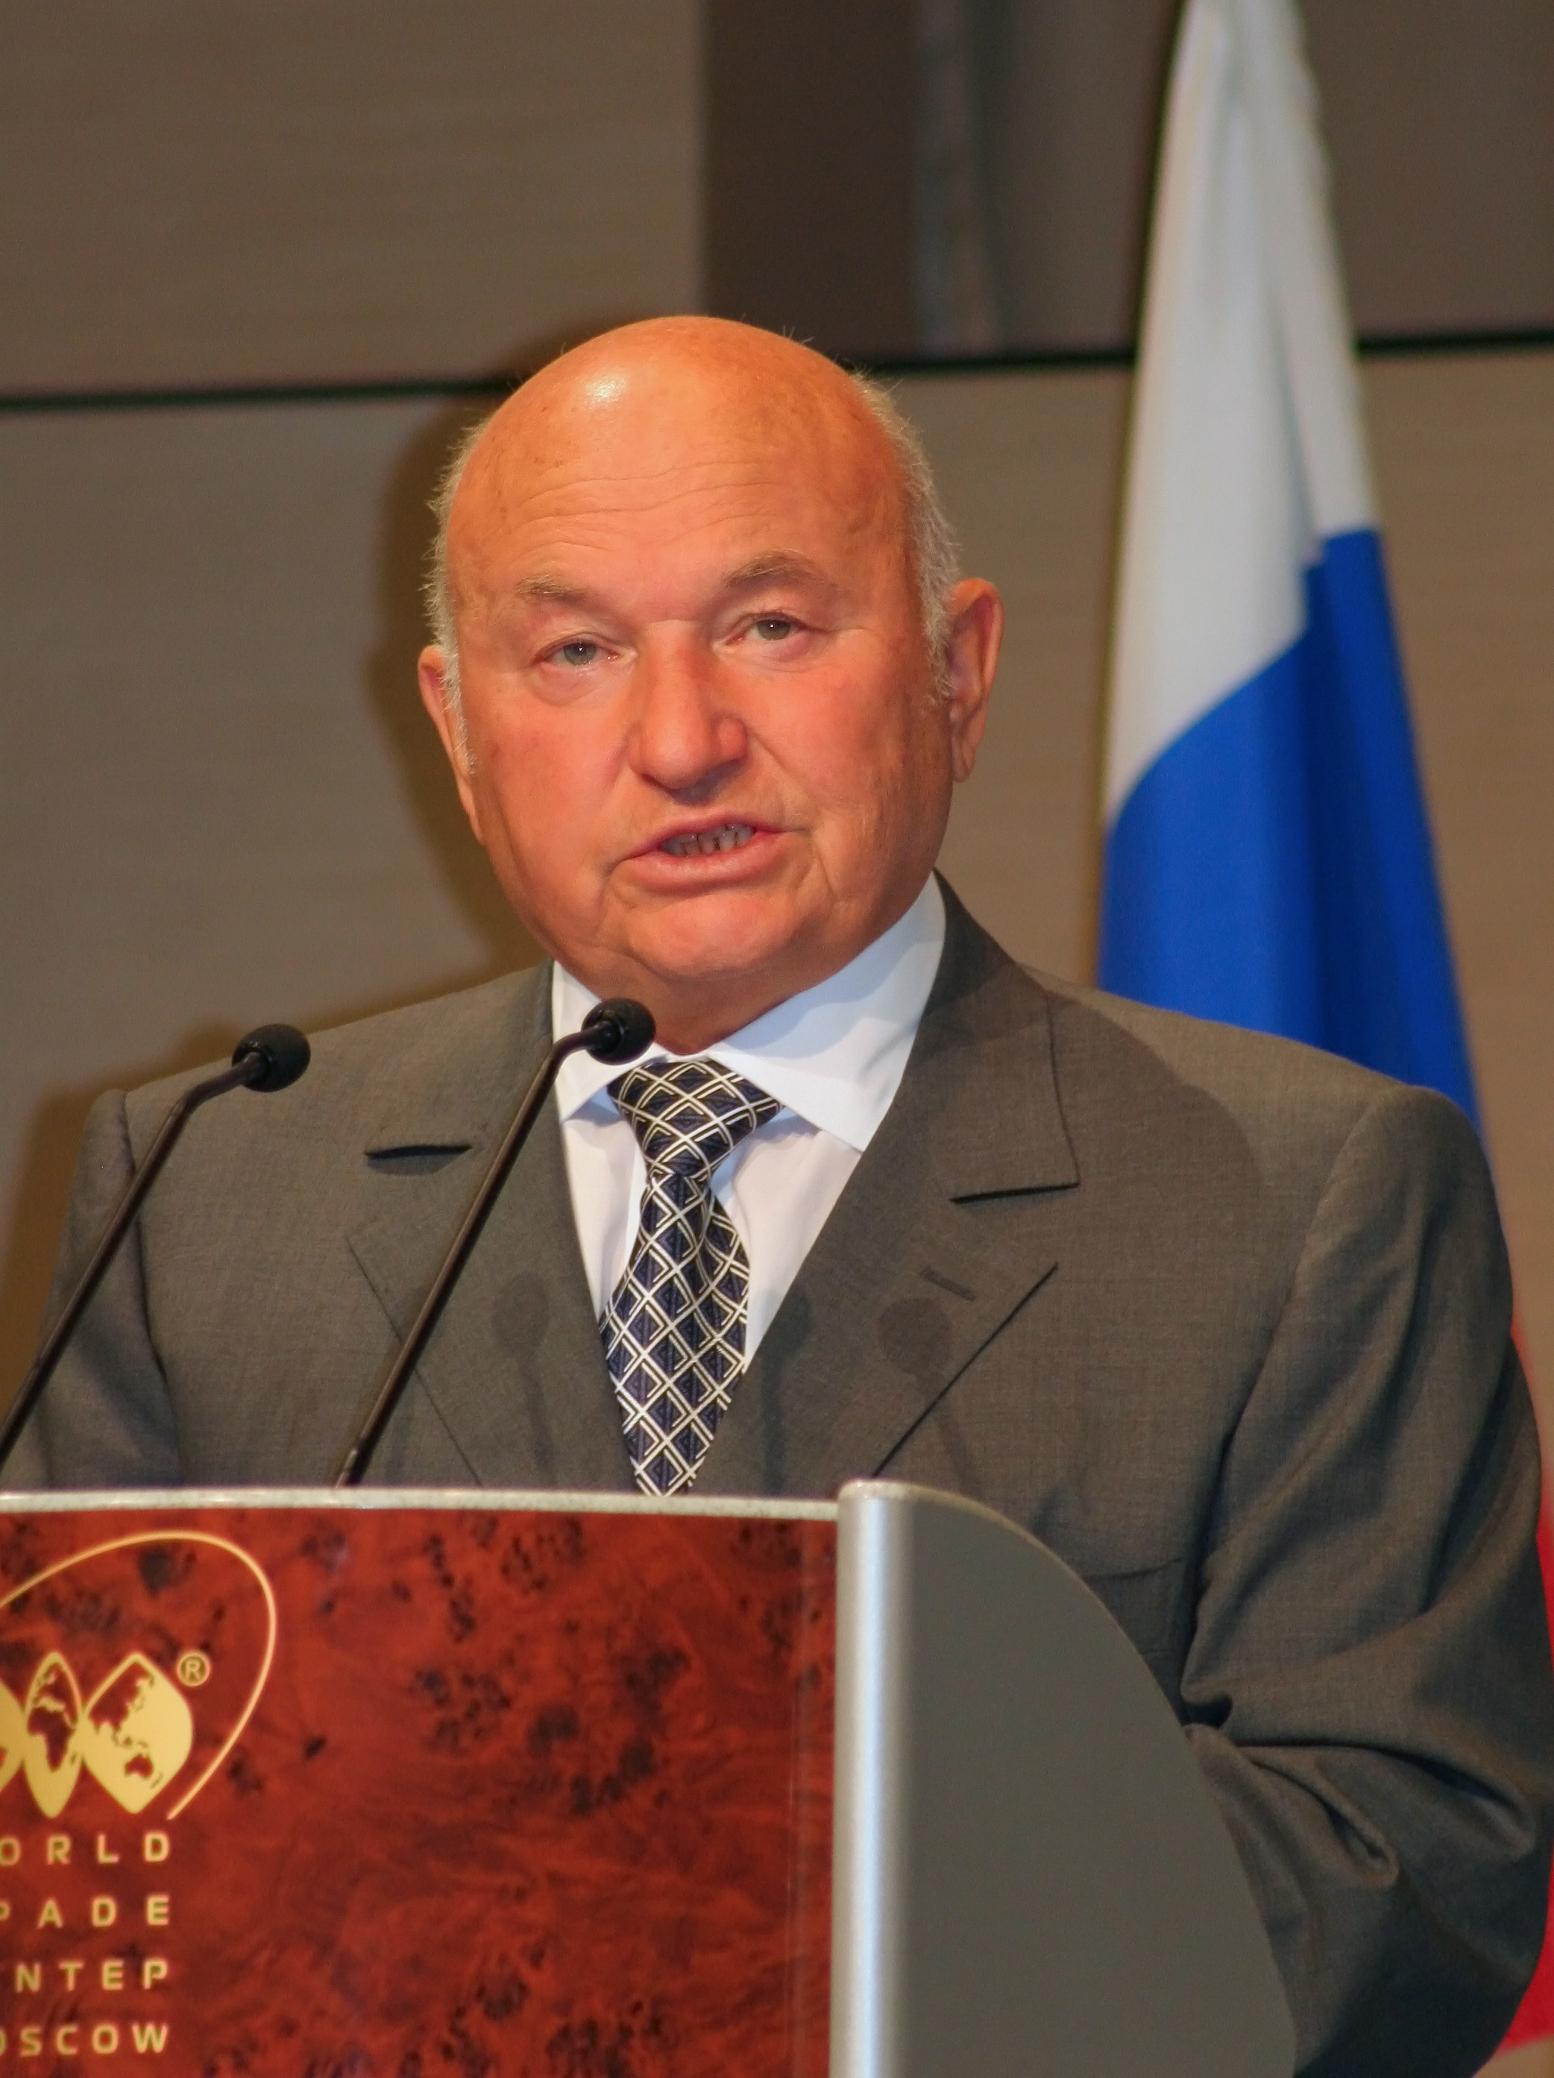 Jurij Luzjkov